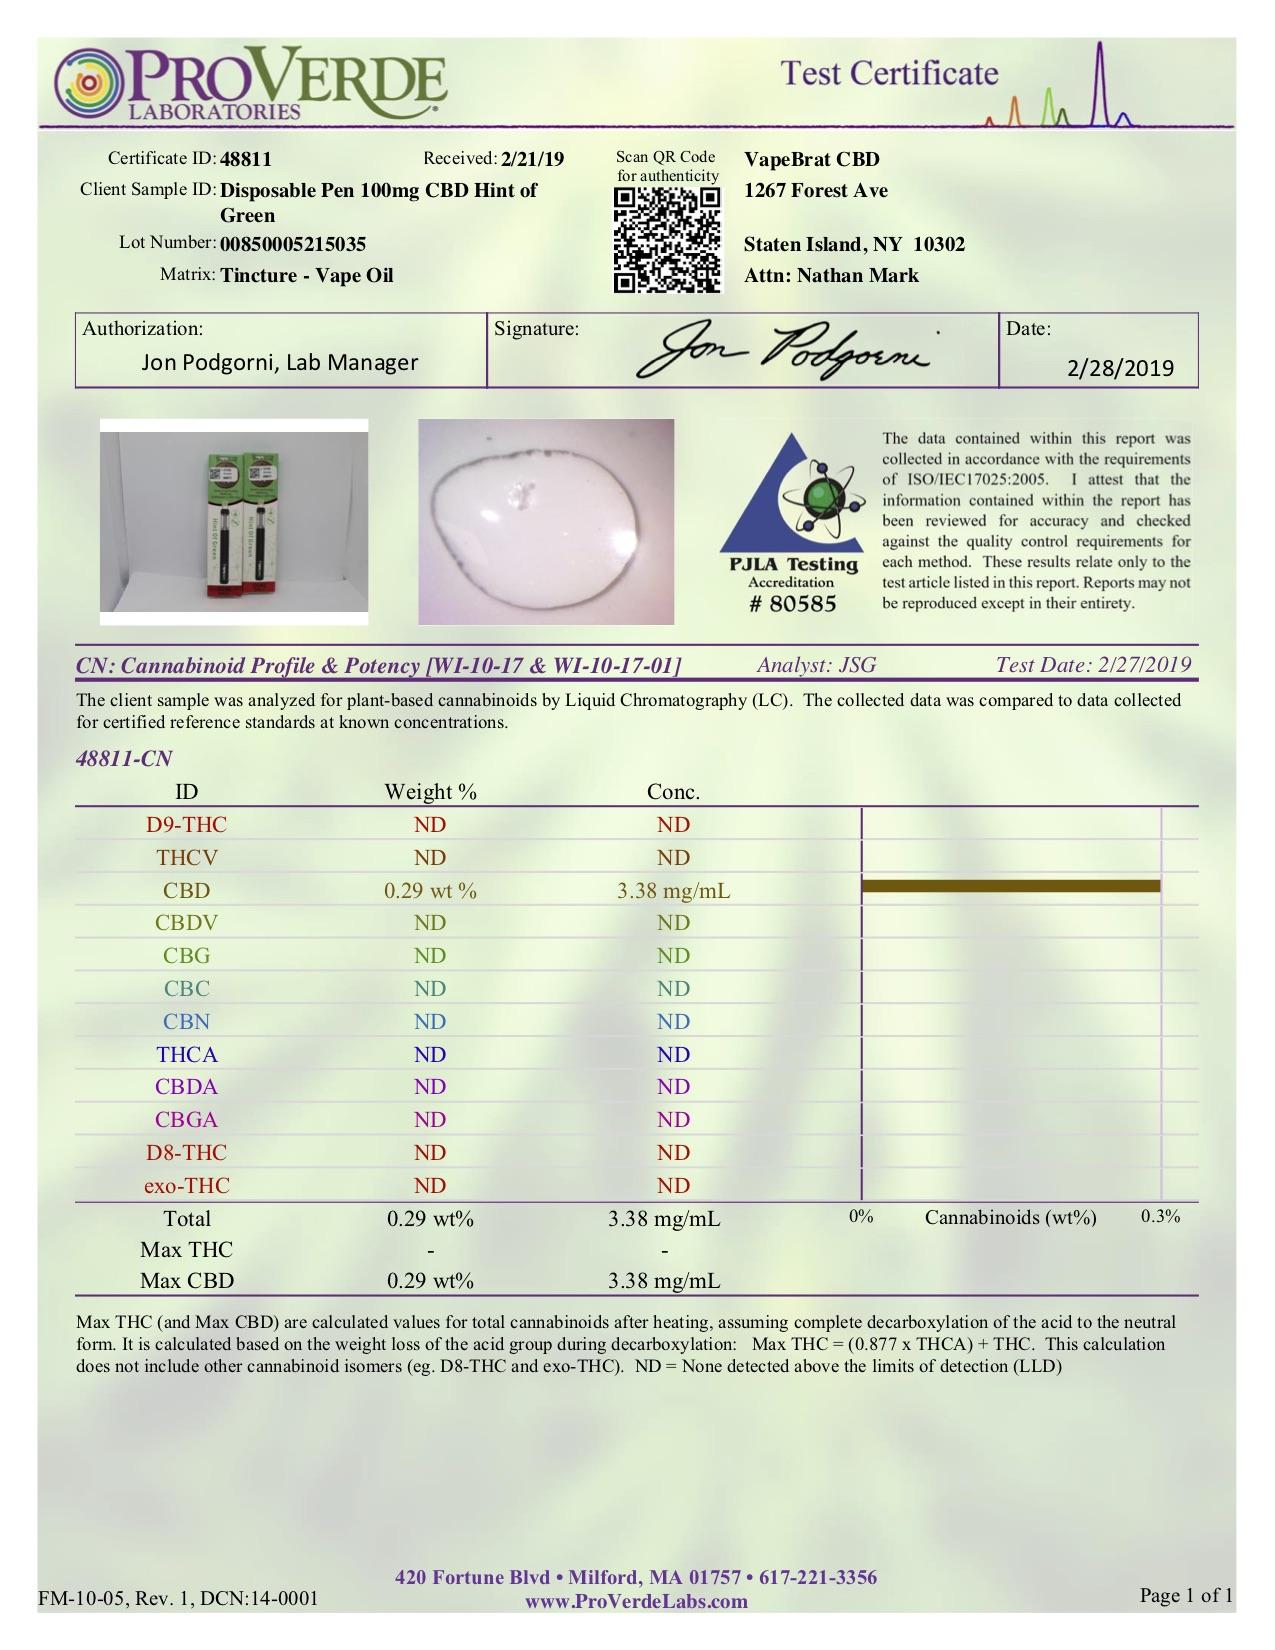 48811-cn-disposable-pen-100mg-cbd-hint-of-green.jpg